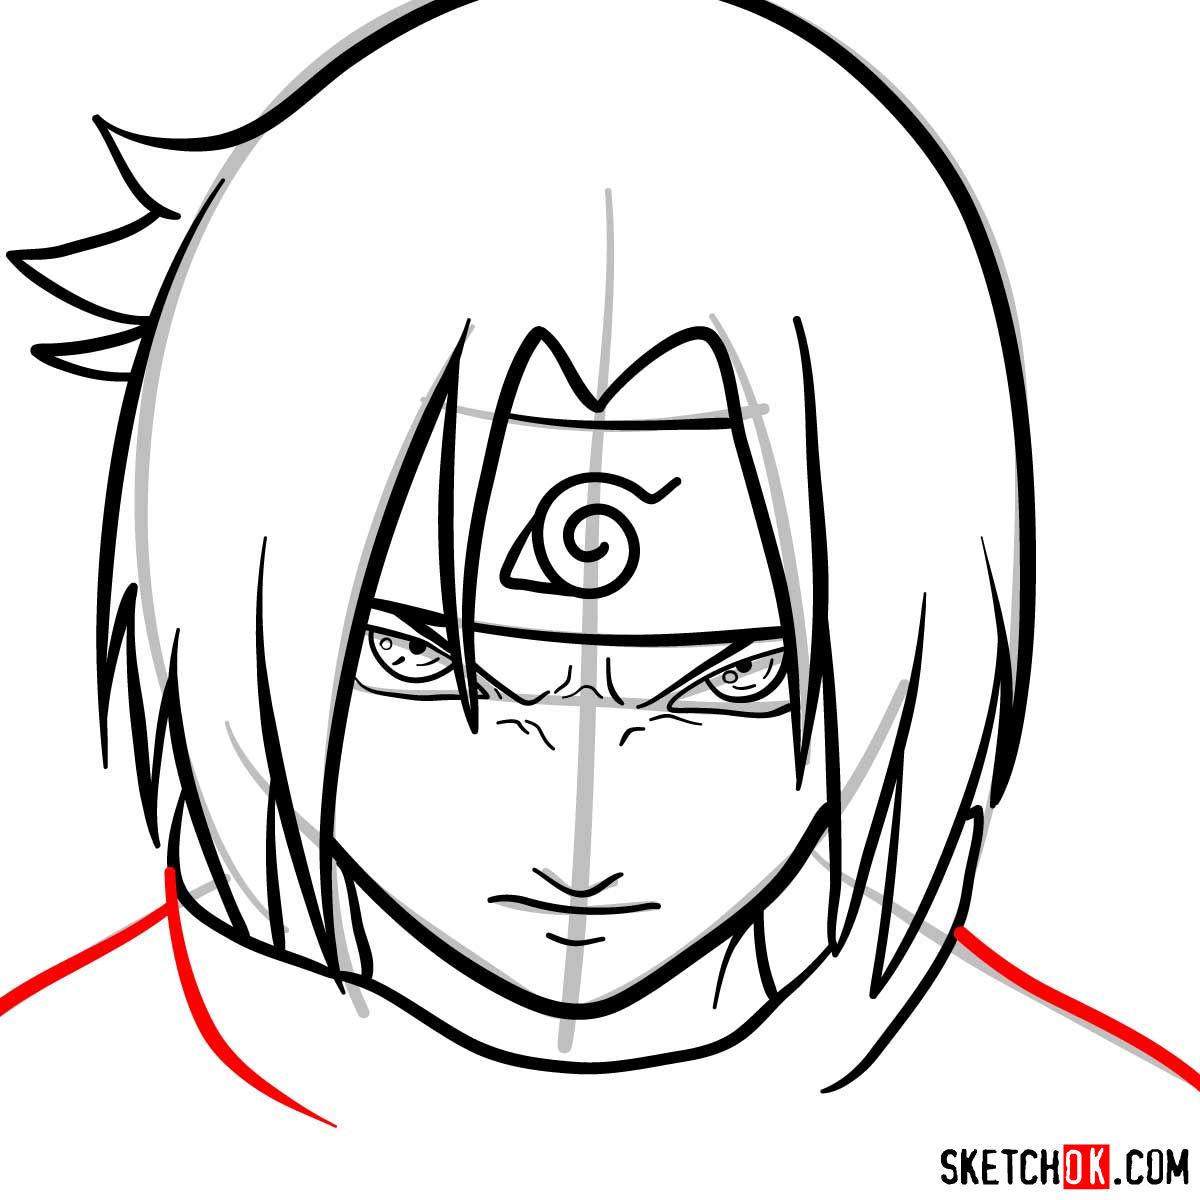 How to draw Sasuke's face (Naruto anime) - step 09